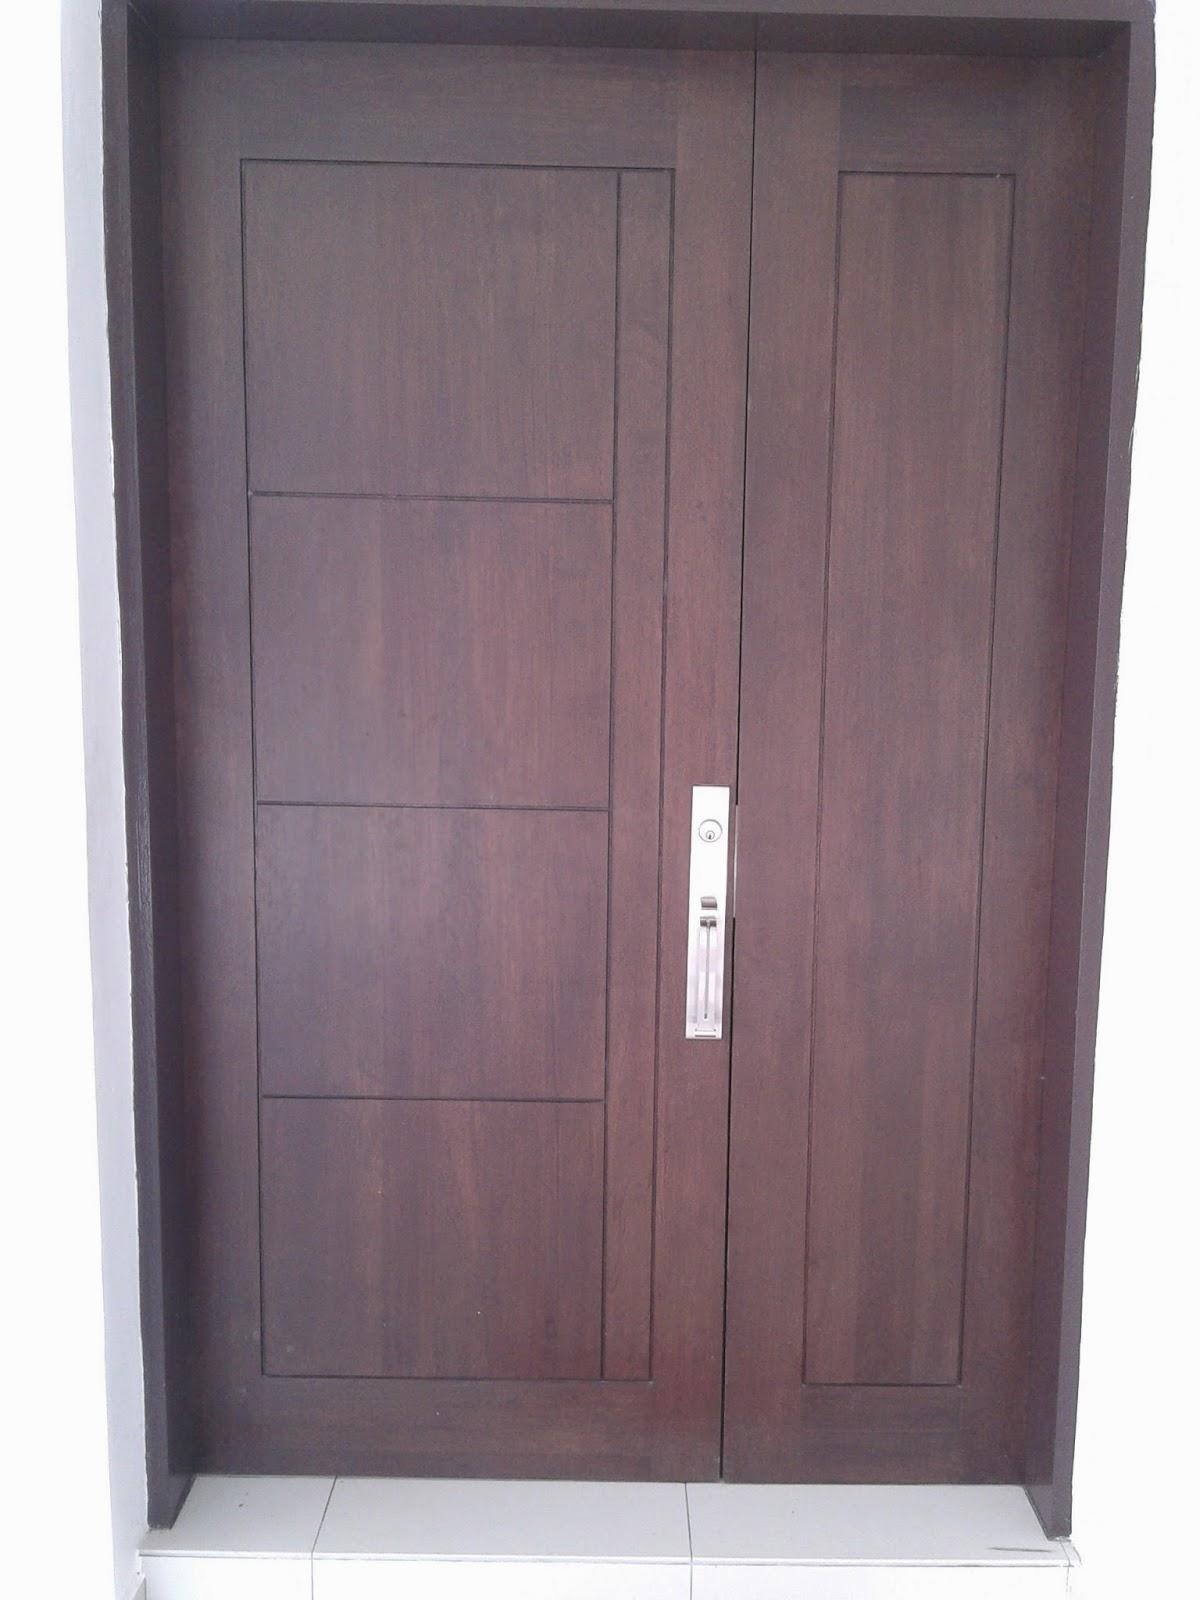 sin choong yan woodwork sdn bhd main door. Black Bedroom Furniture Sets. Home Design Ideas